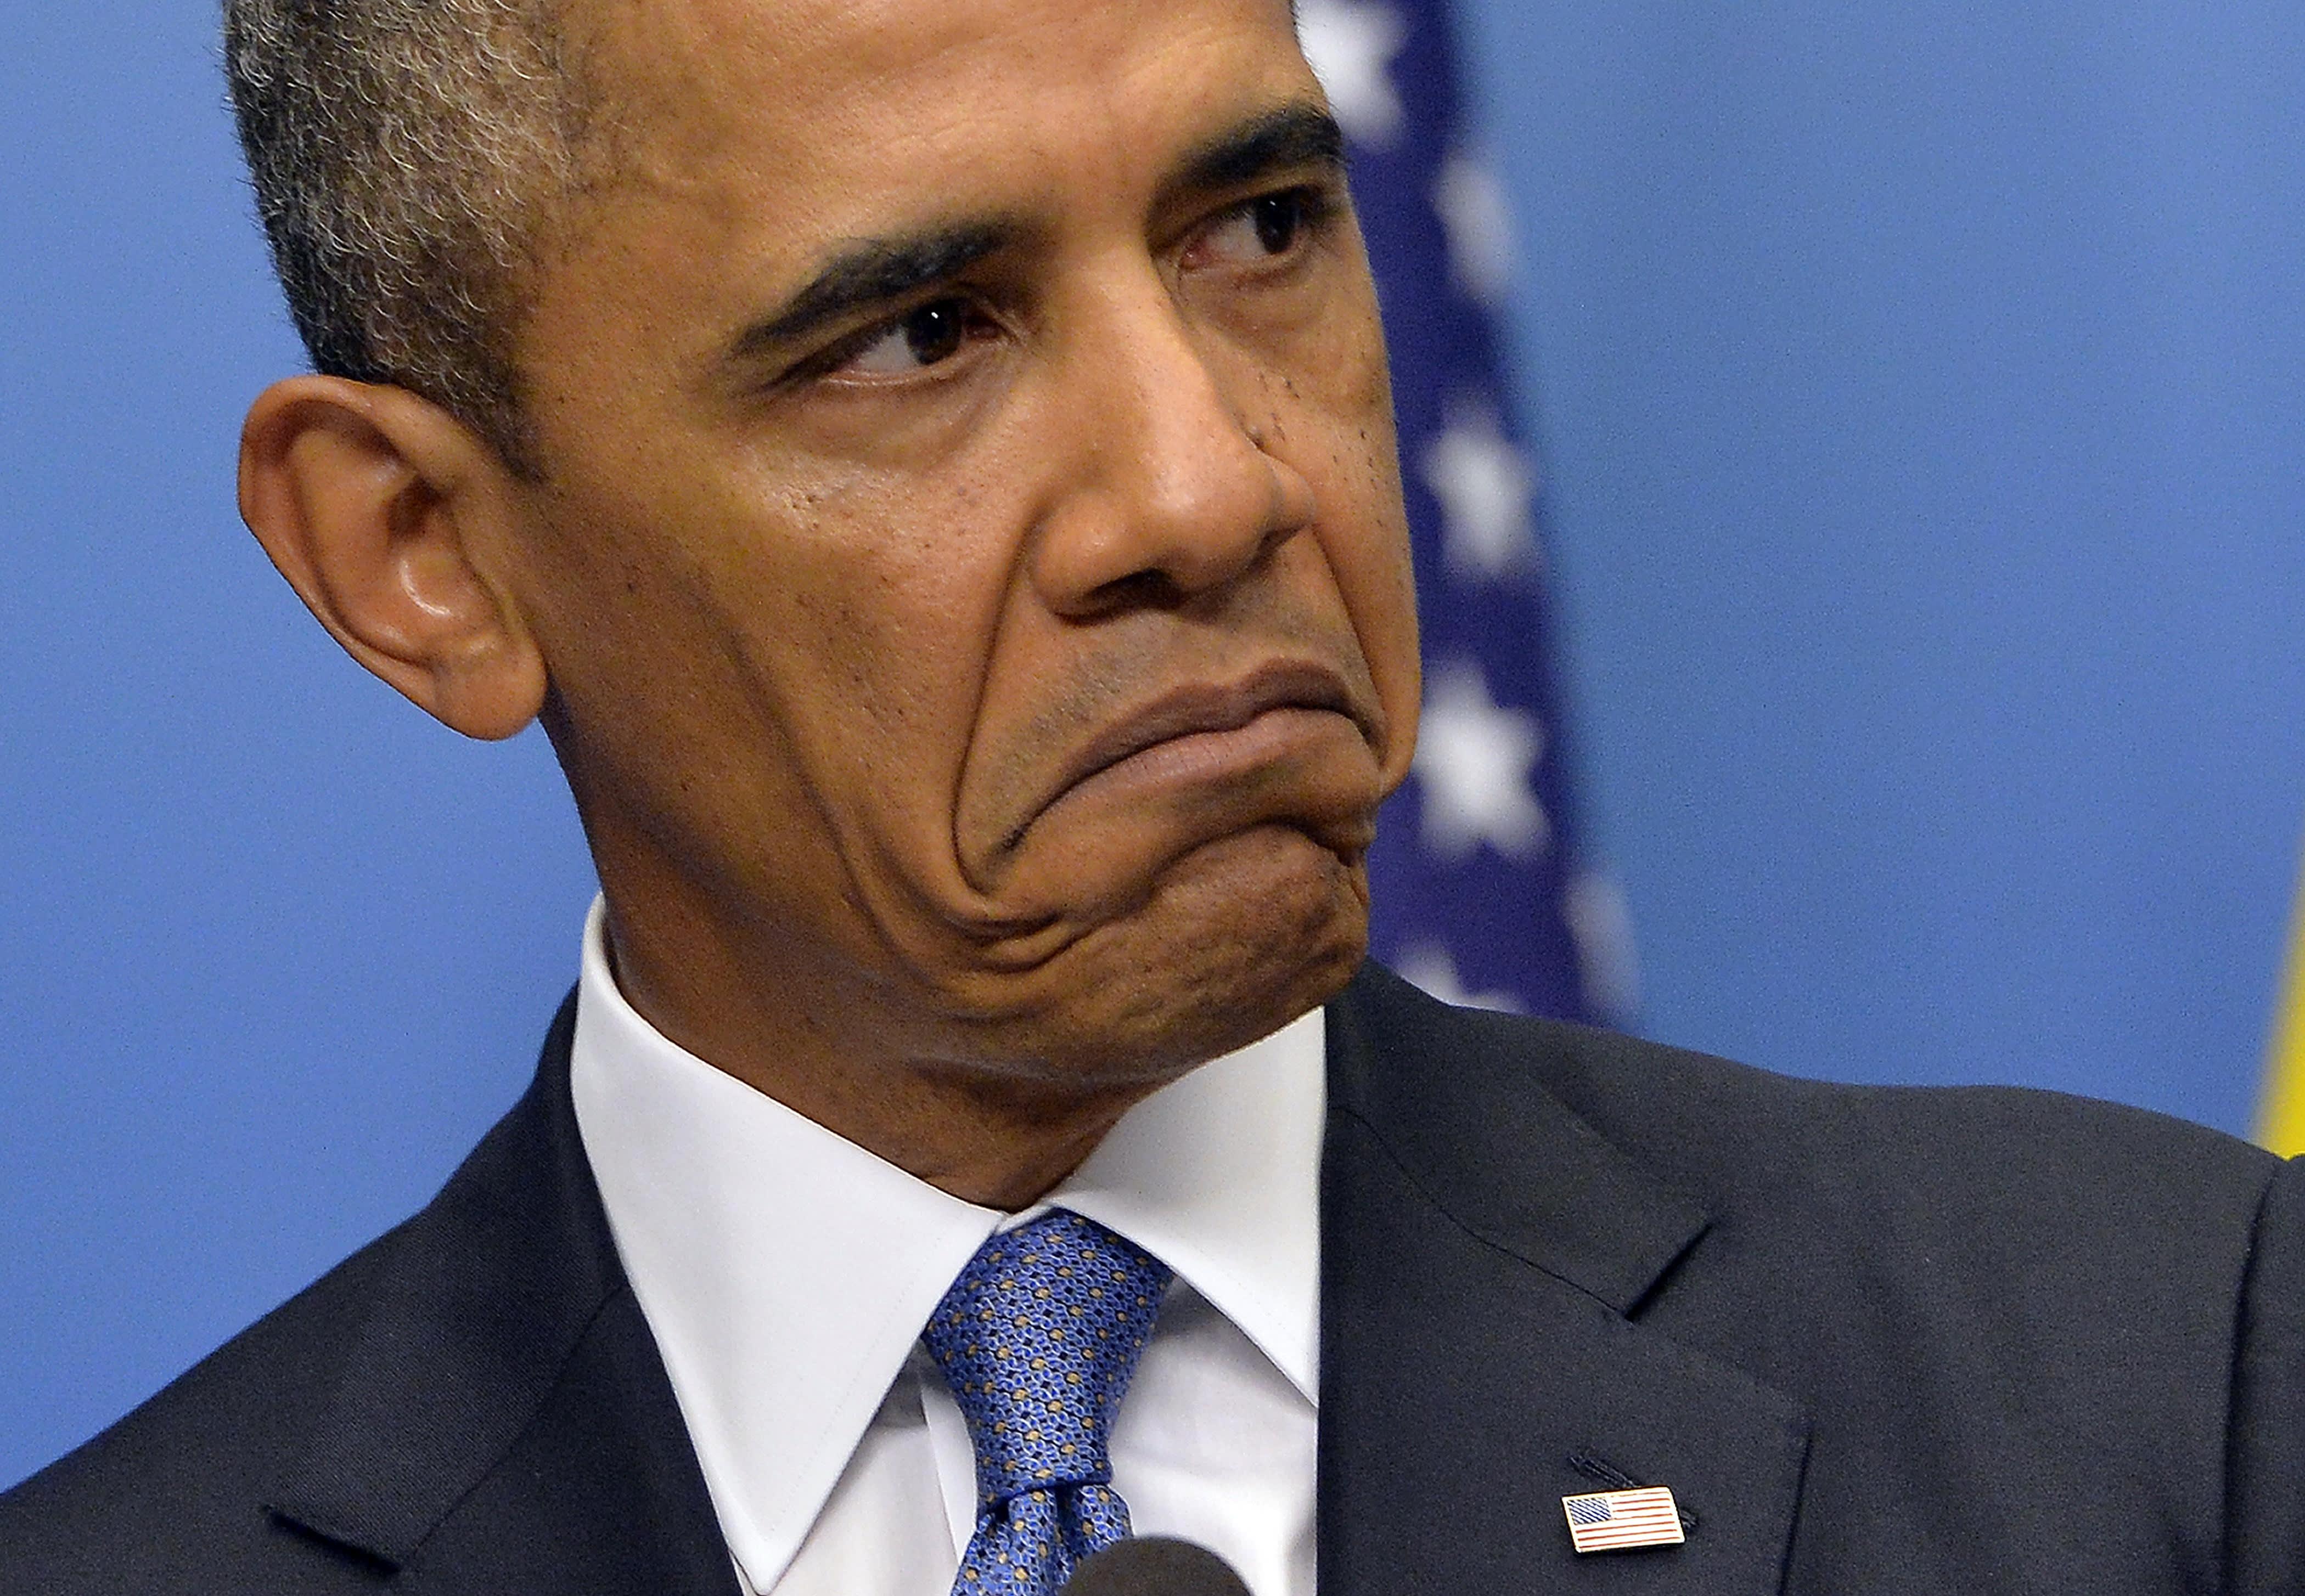 Premium: Barack Obama sad face troubled